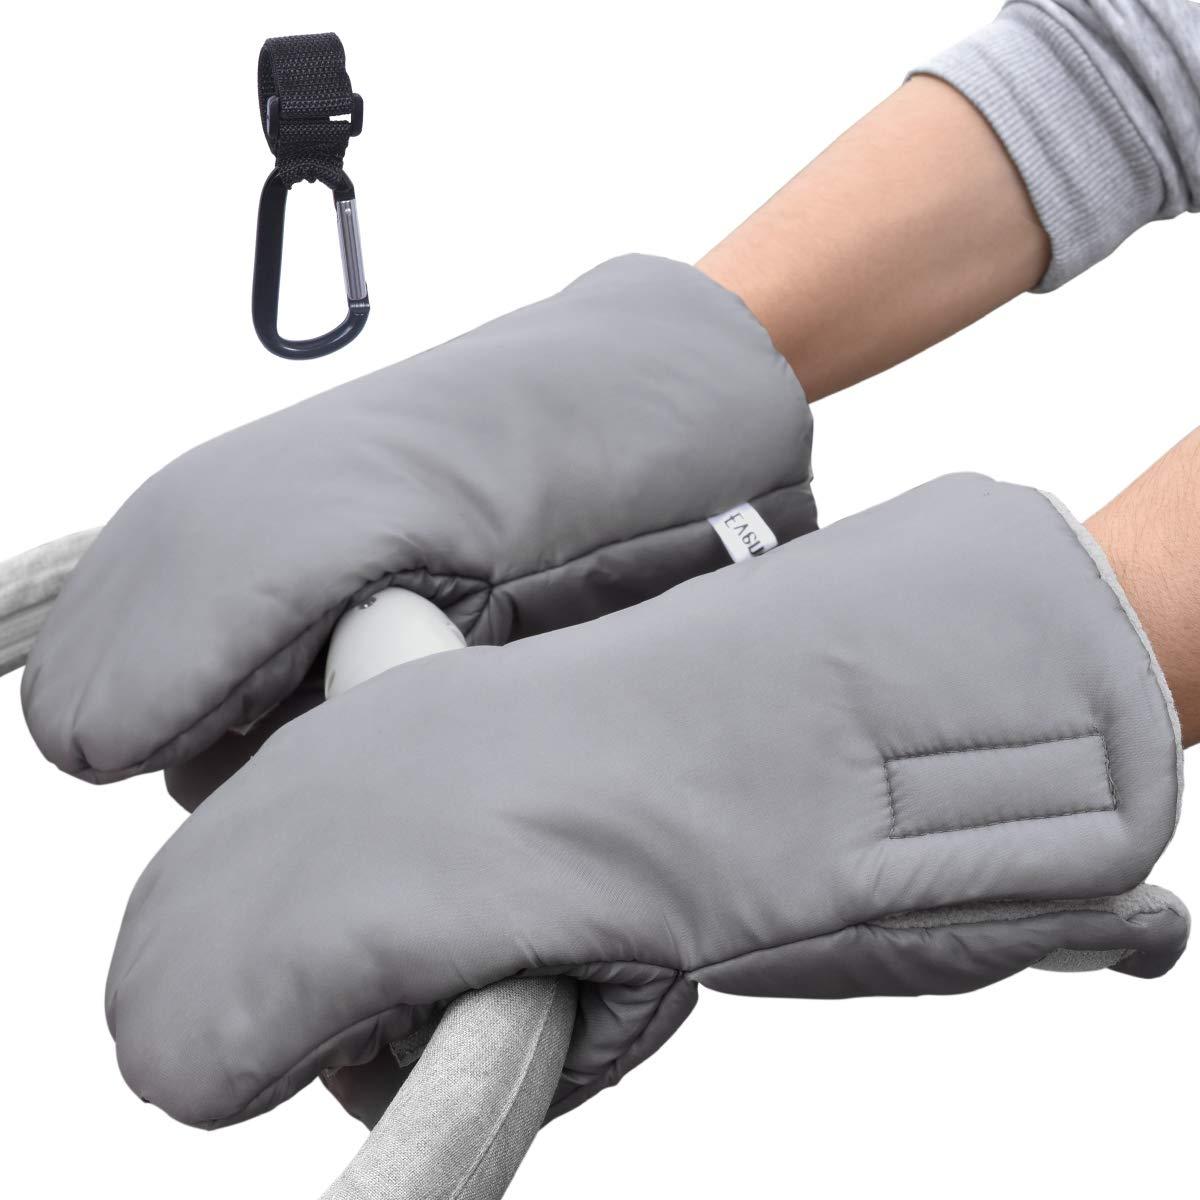 Evencaphy Stroller Gloves Universal Anti-Freeze Pram Hand Muffs Winter Gloves Pushchair Hand Warmers Water-Resistant with Stroller Hook, Grey